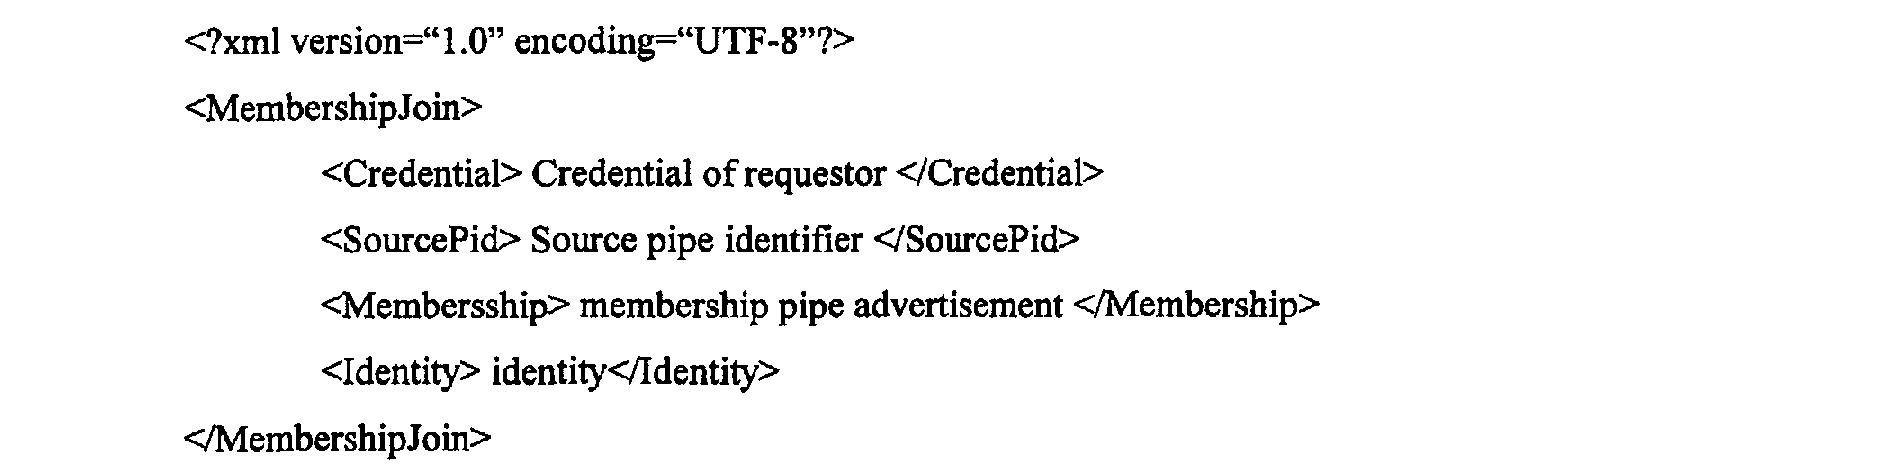 EP1229442A2 - Peer-to-peer computing architecture - Google